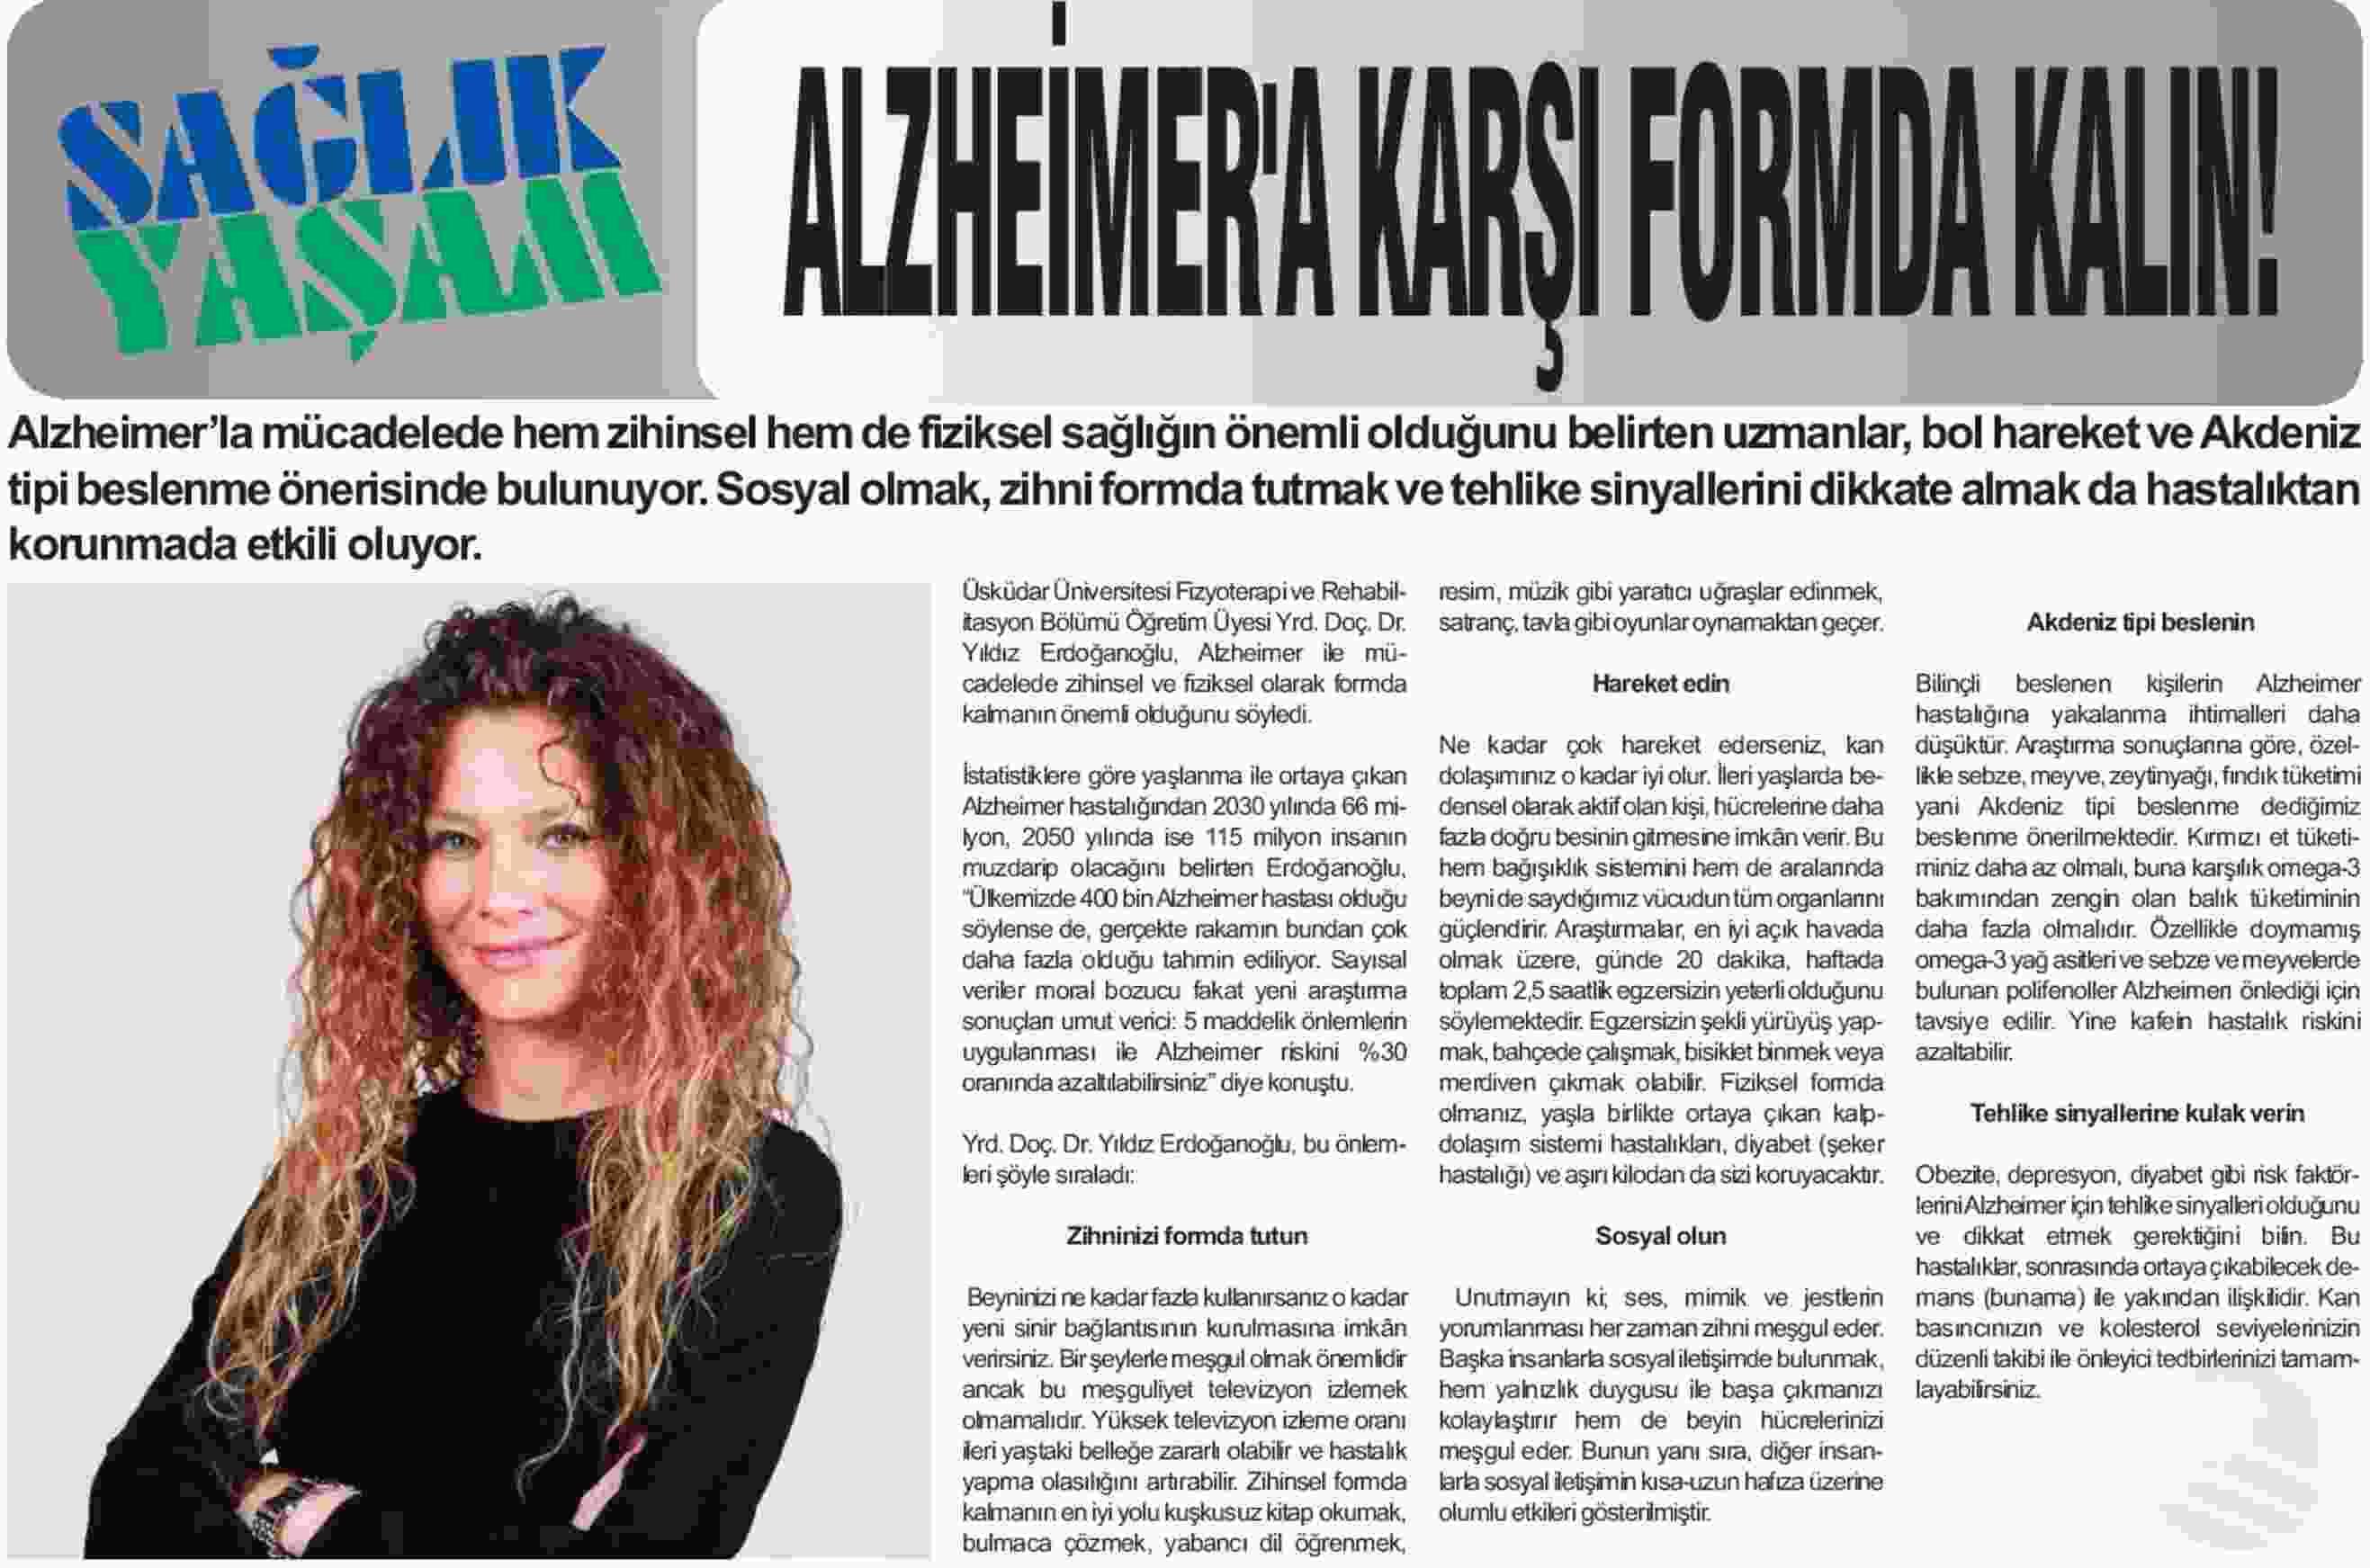 Alzheimer'a karşı formda kalın